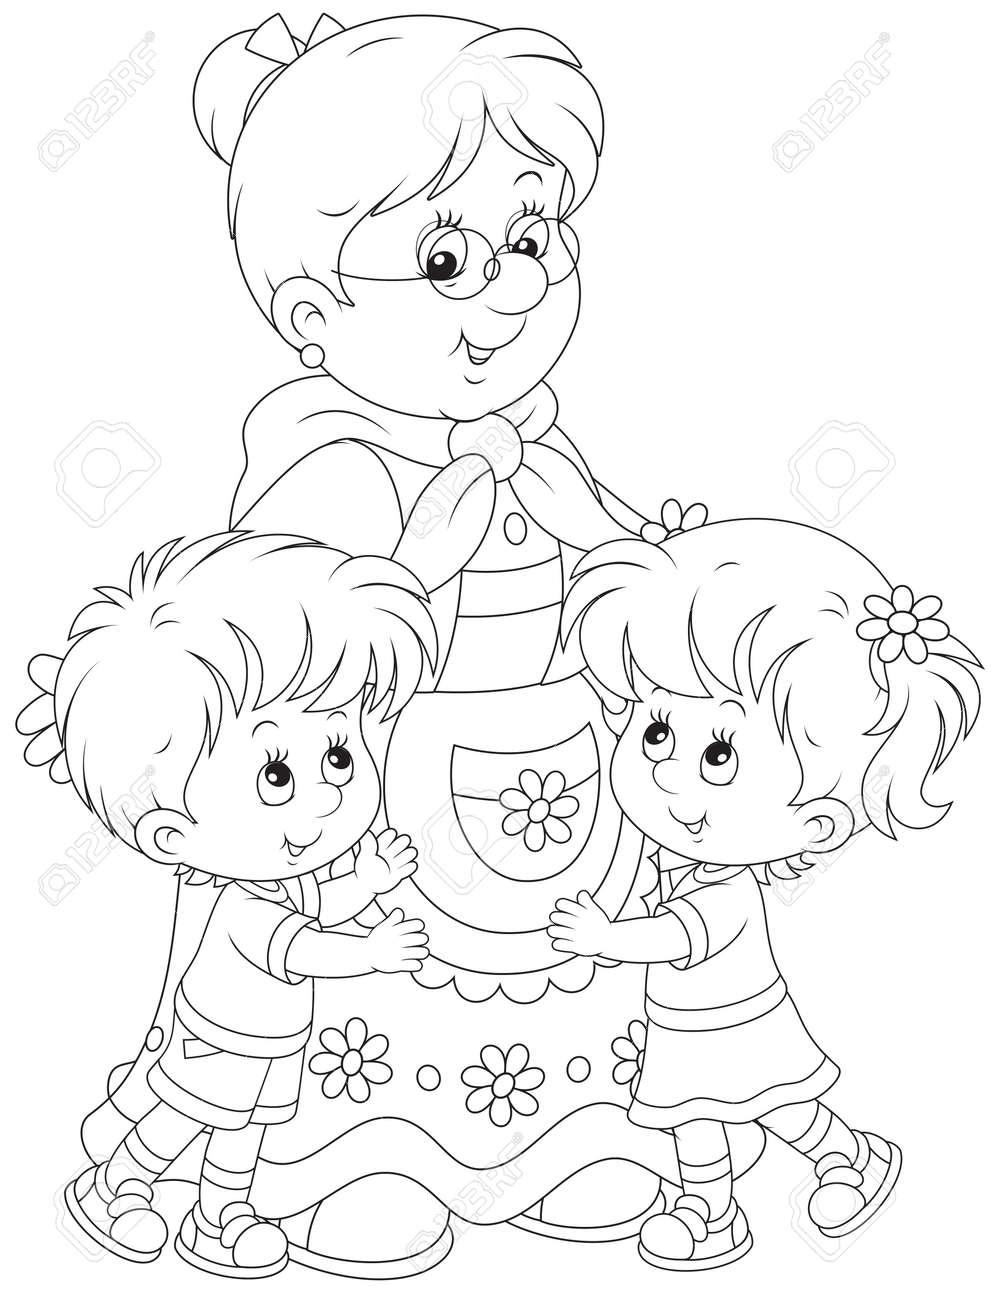 Granny and her grandchildren - 27448837